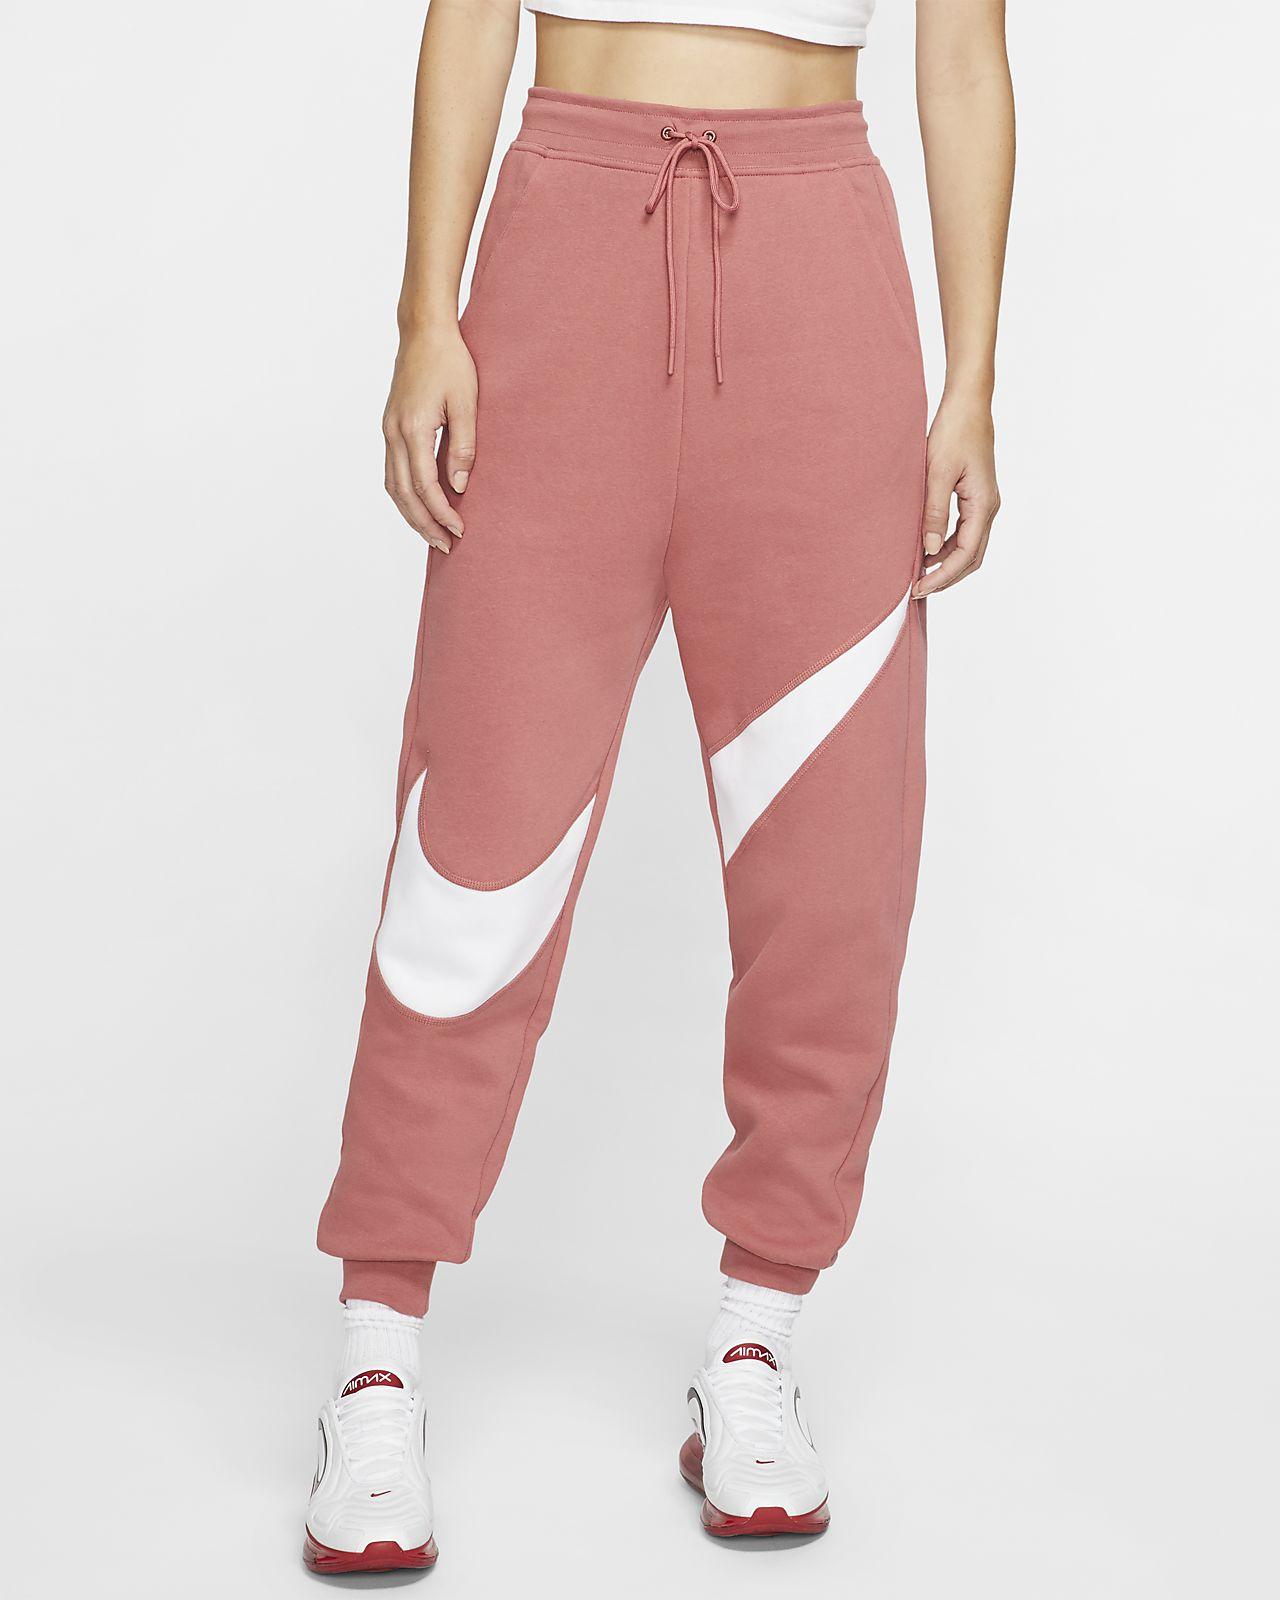 Nike Sportswear Swoosh Pantalons de teixit Fleece - Dona